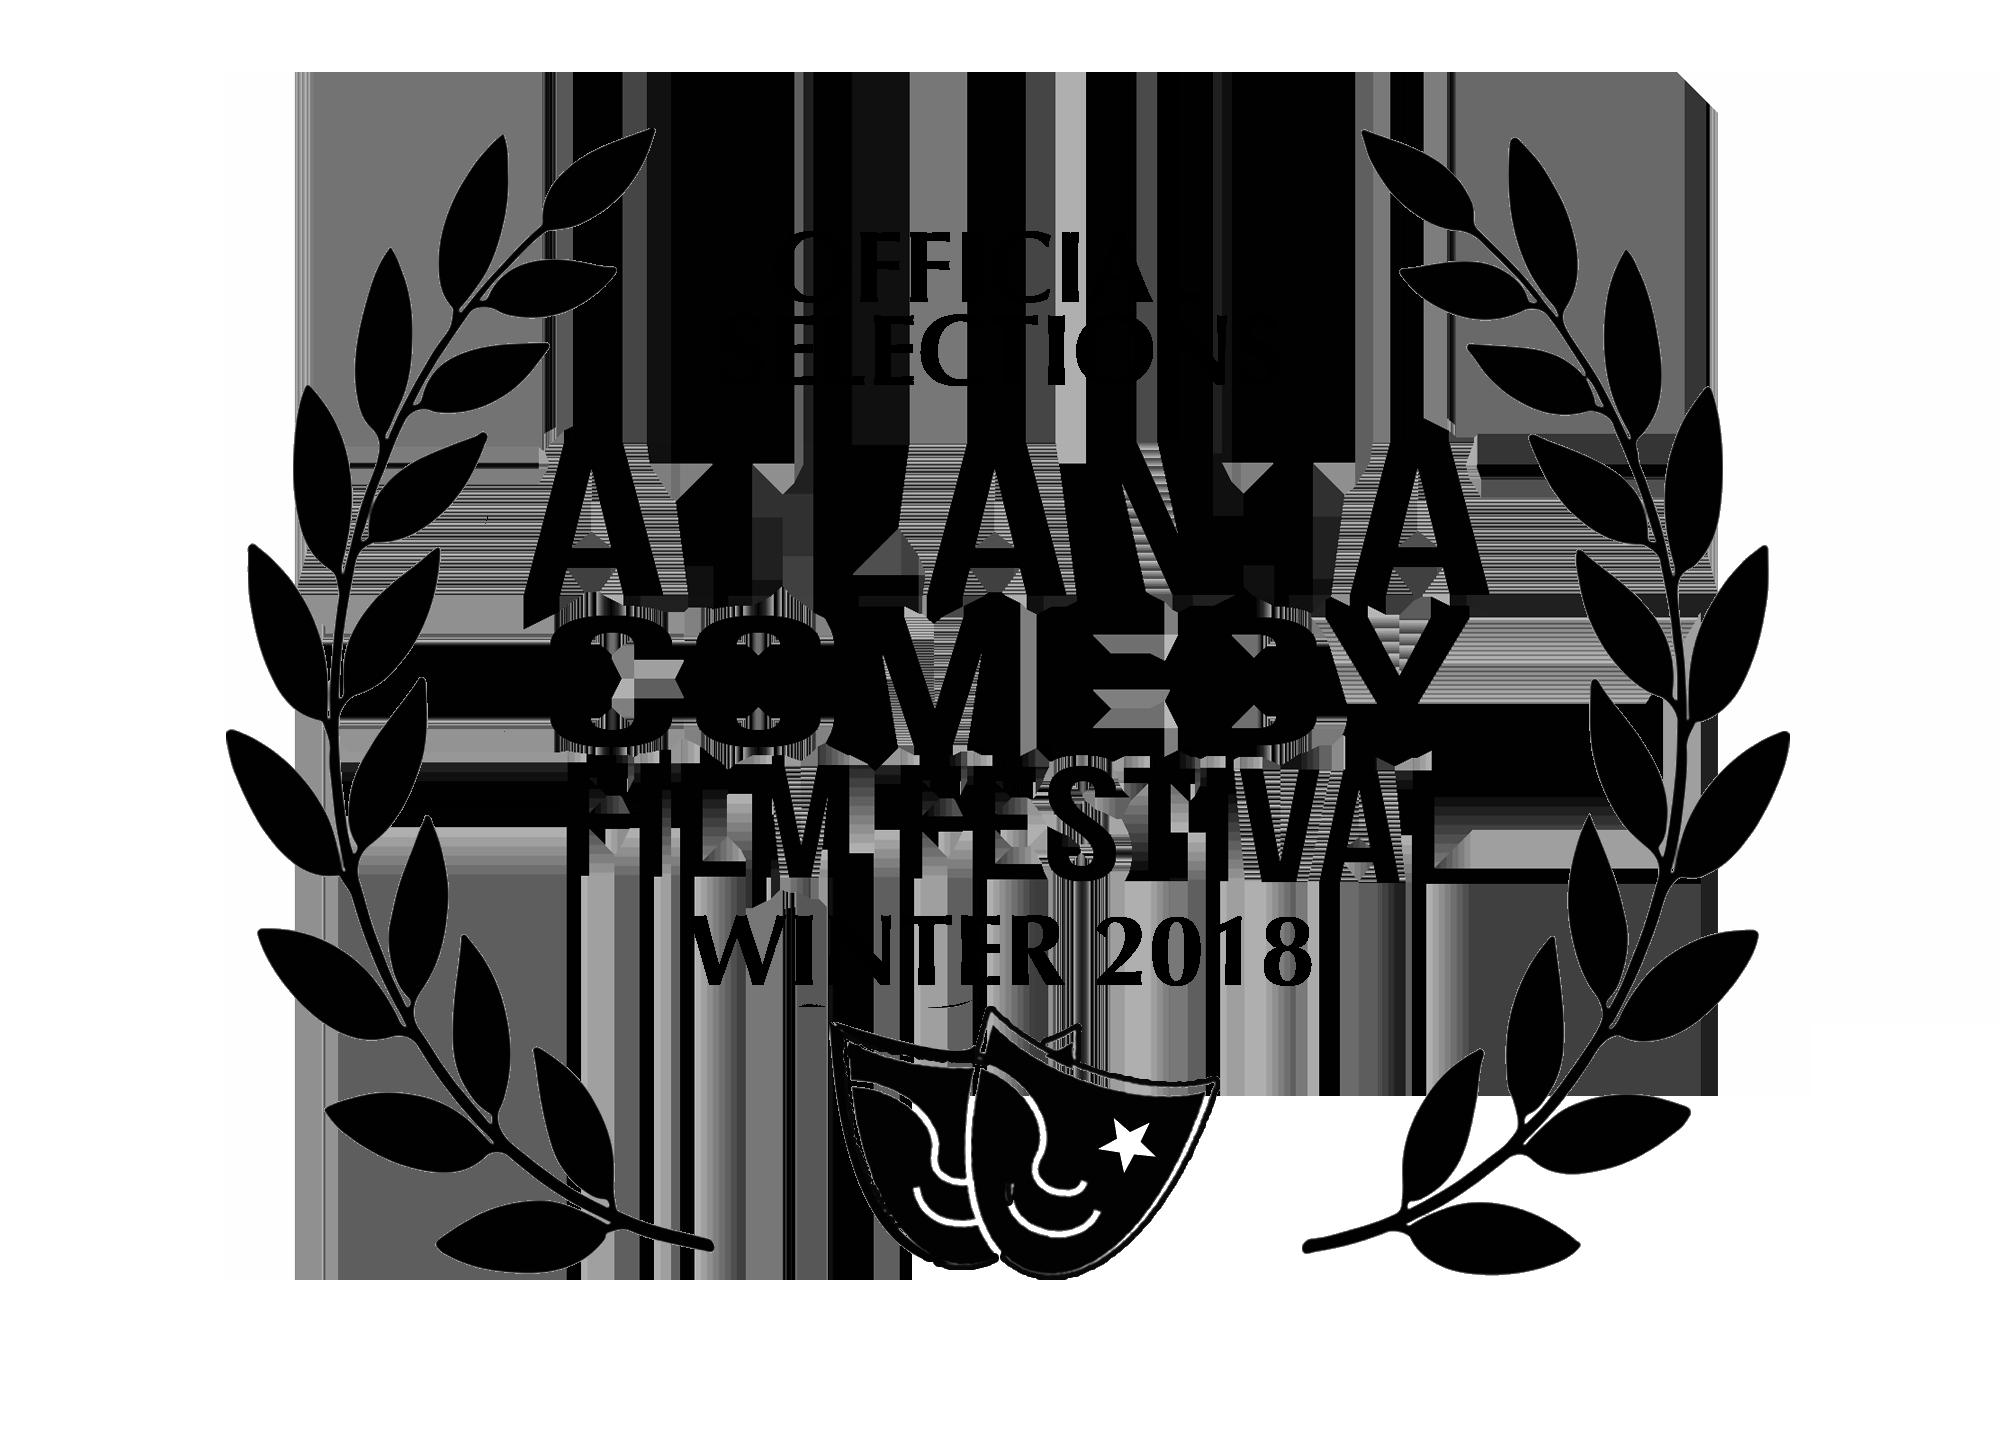 Atlanta-Comedy-Film-Festival-Laurel-Winter-2018-Black-Transparent.png